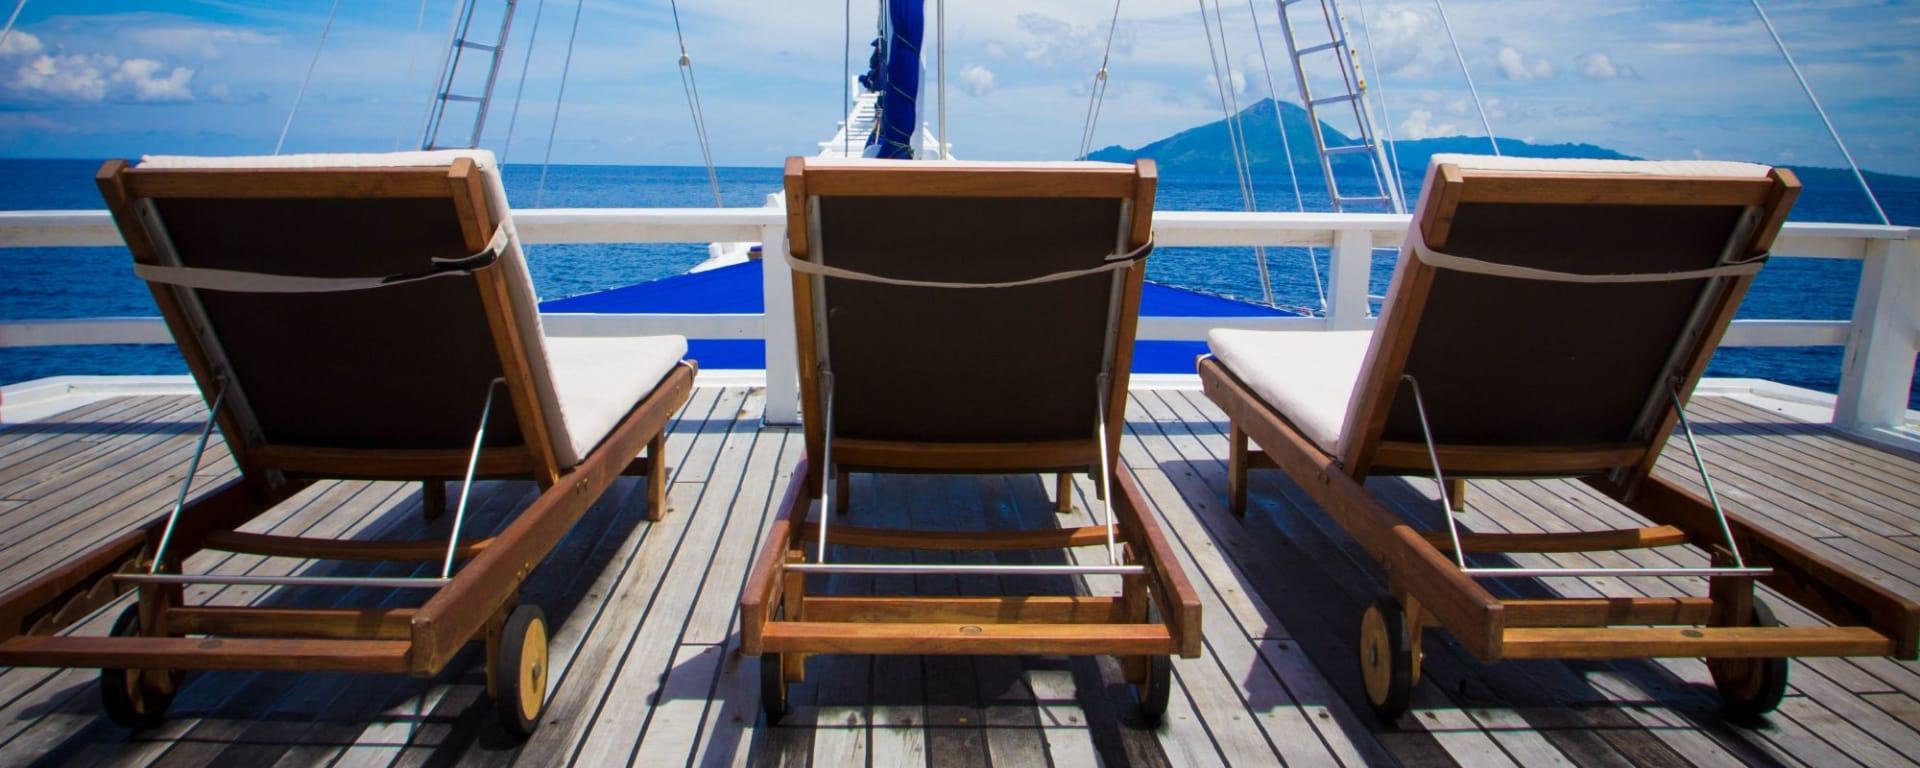 Kreuzfahrt im Inselparadies Raja Ampat ab Sorong: Ombak Putih Relax